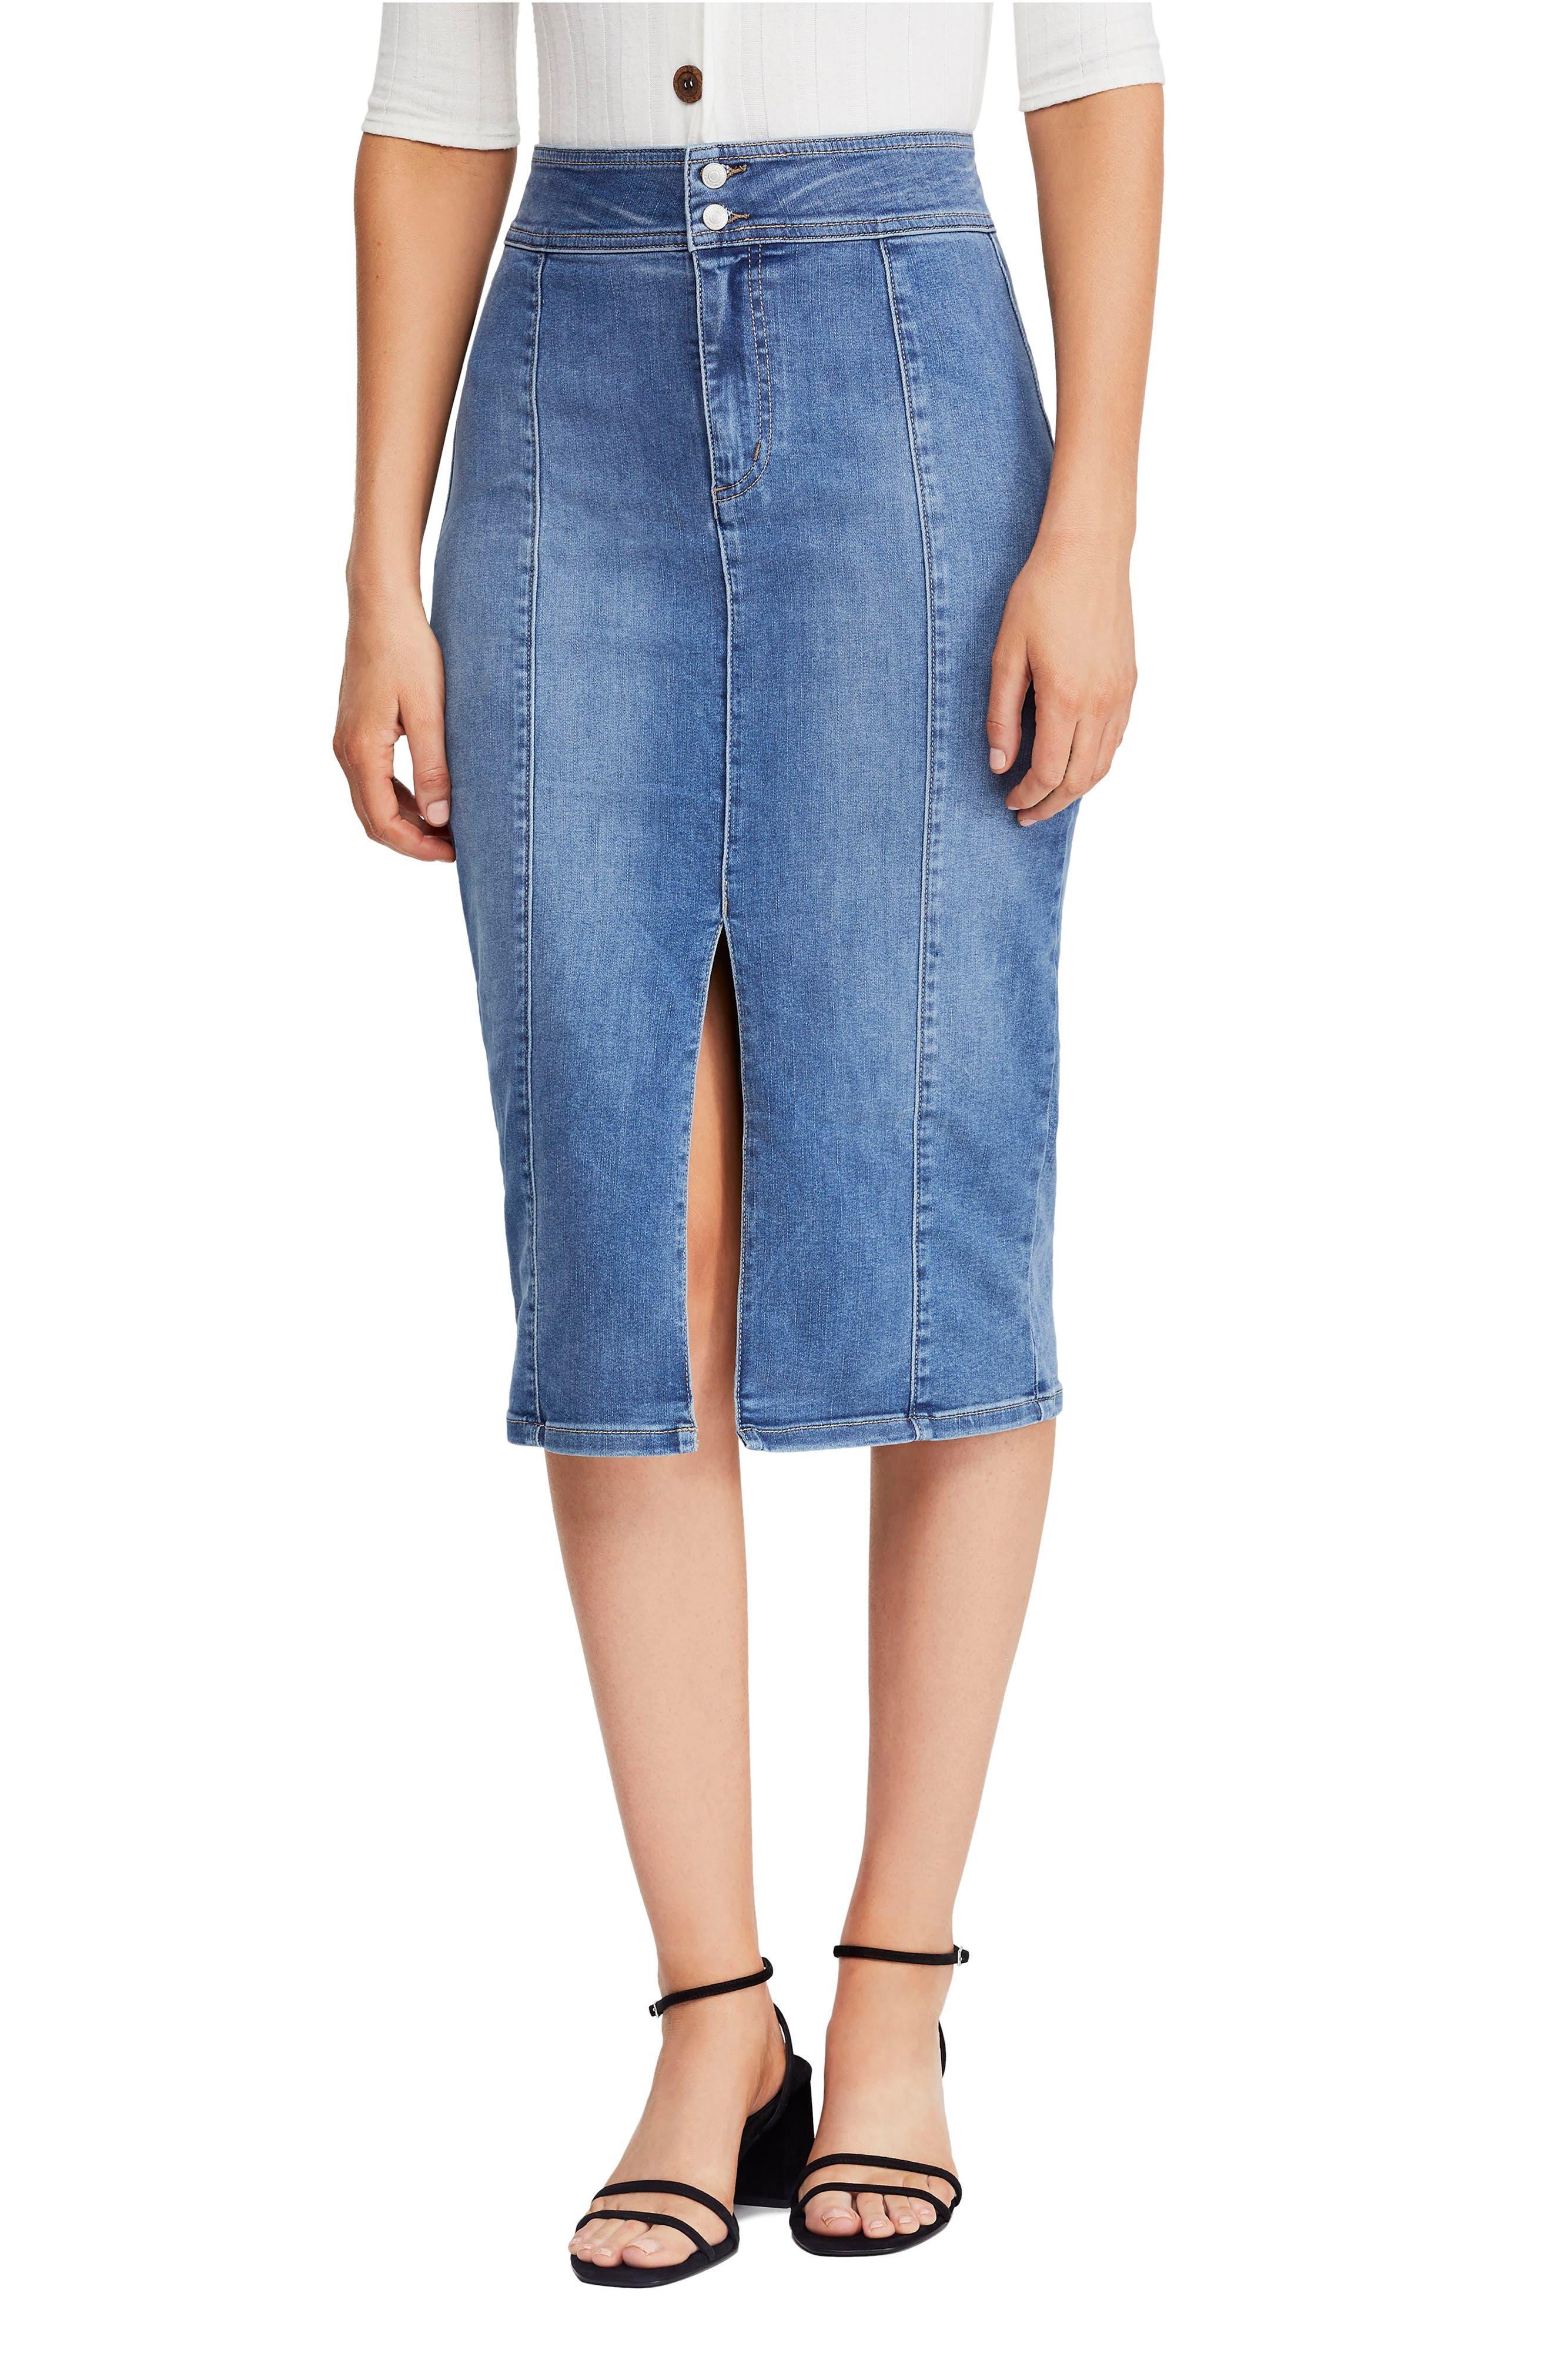 Free People Maddie Denim Midi Skirt, Blue